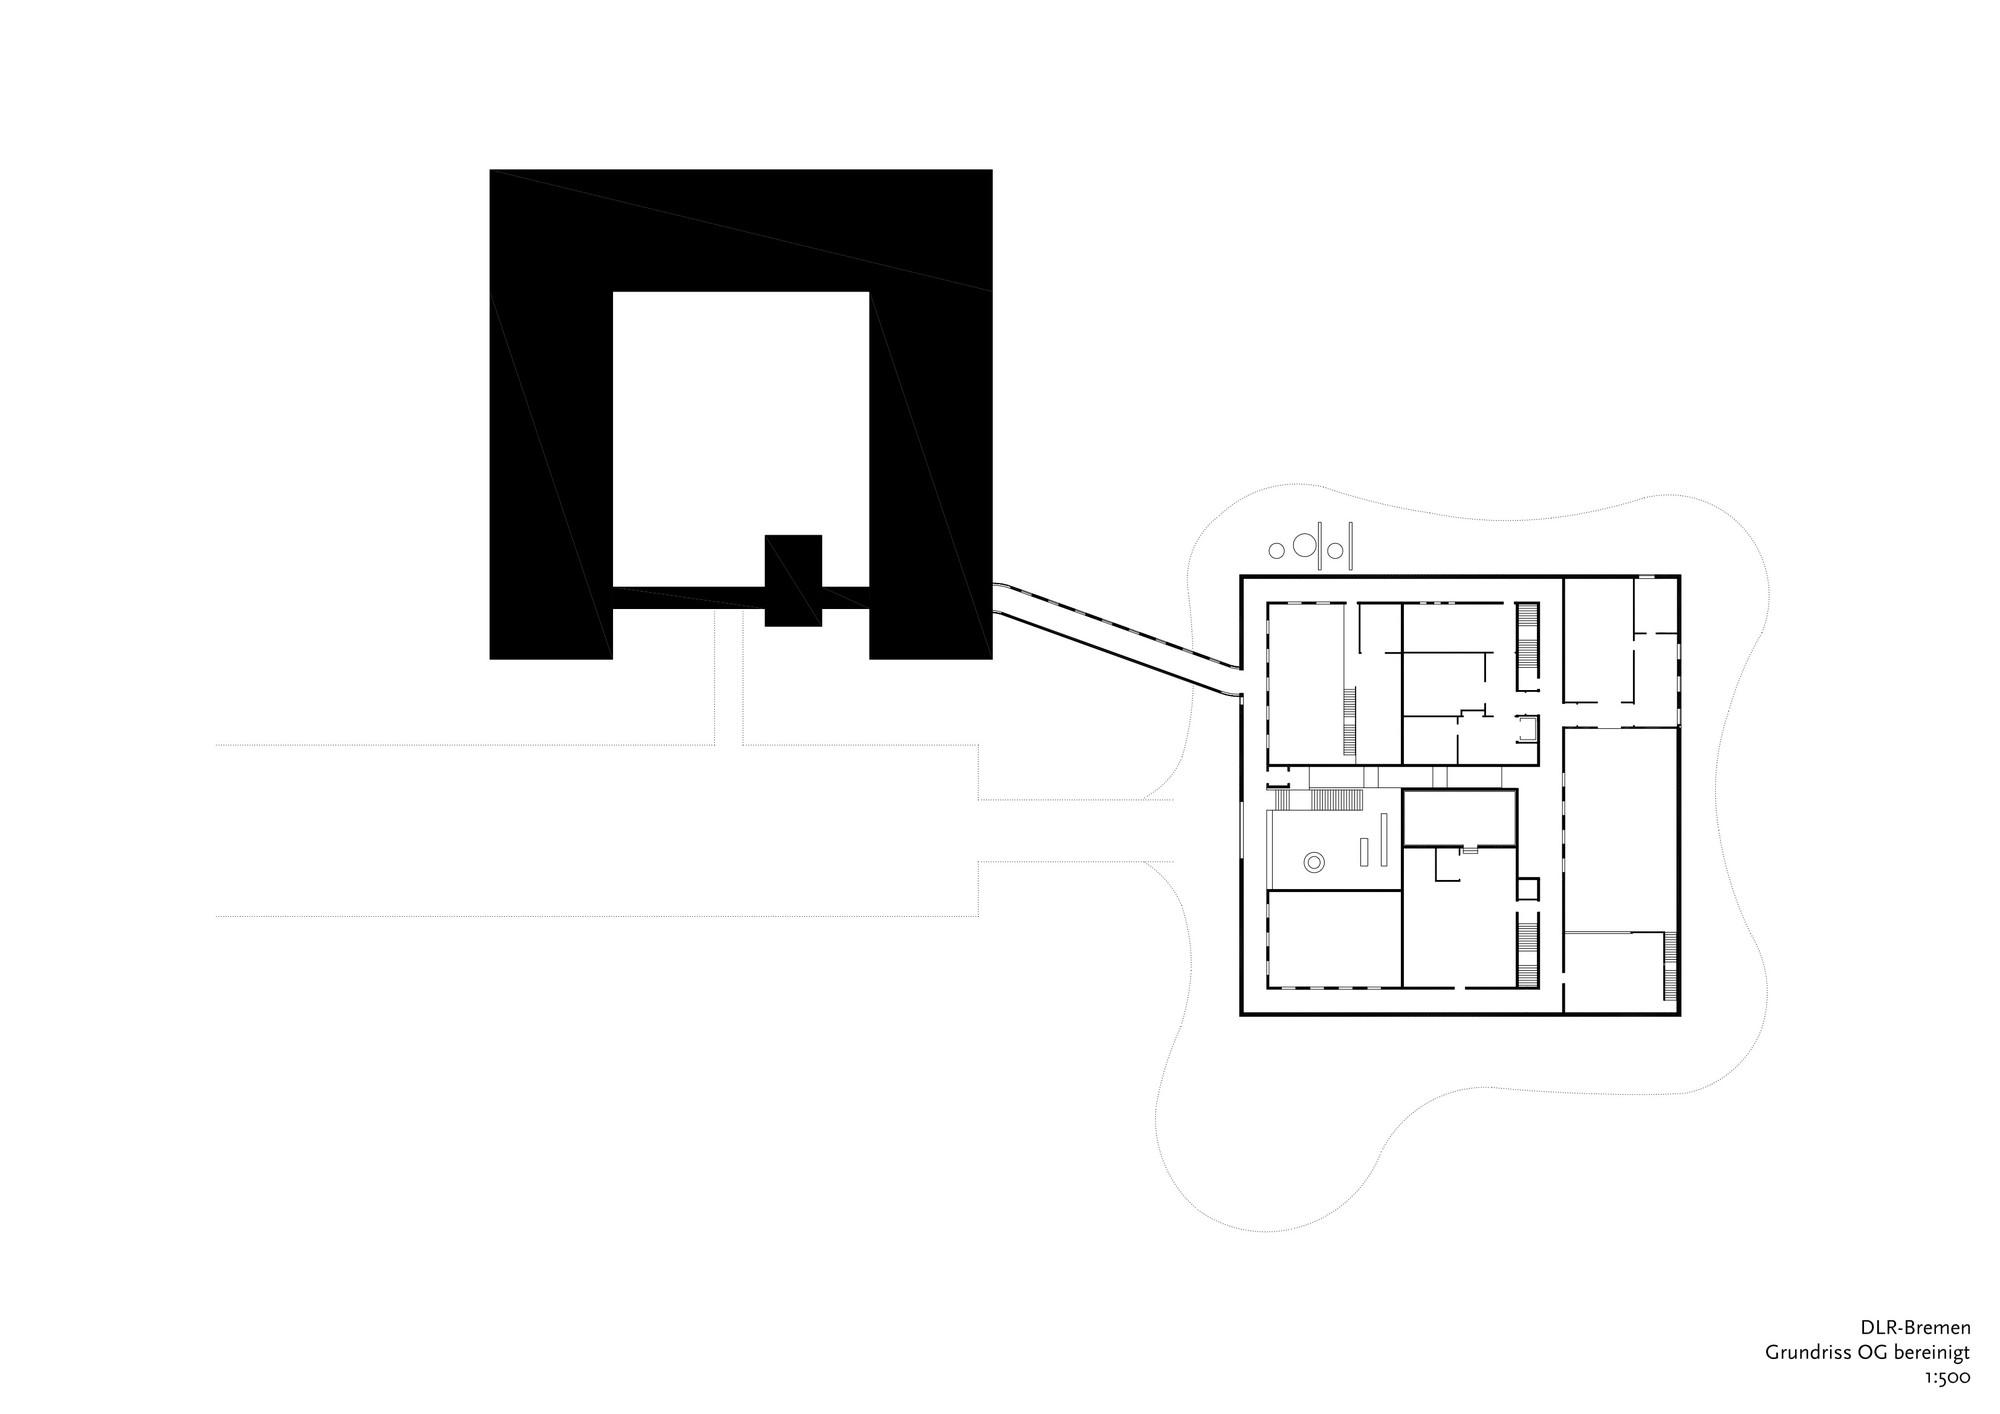 research building dlr spacelift ksg architekten architekten bda feldschnieders kister. Black Bedroom Furniture Sets. Home Design Ideas